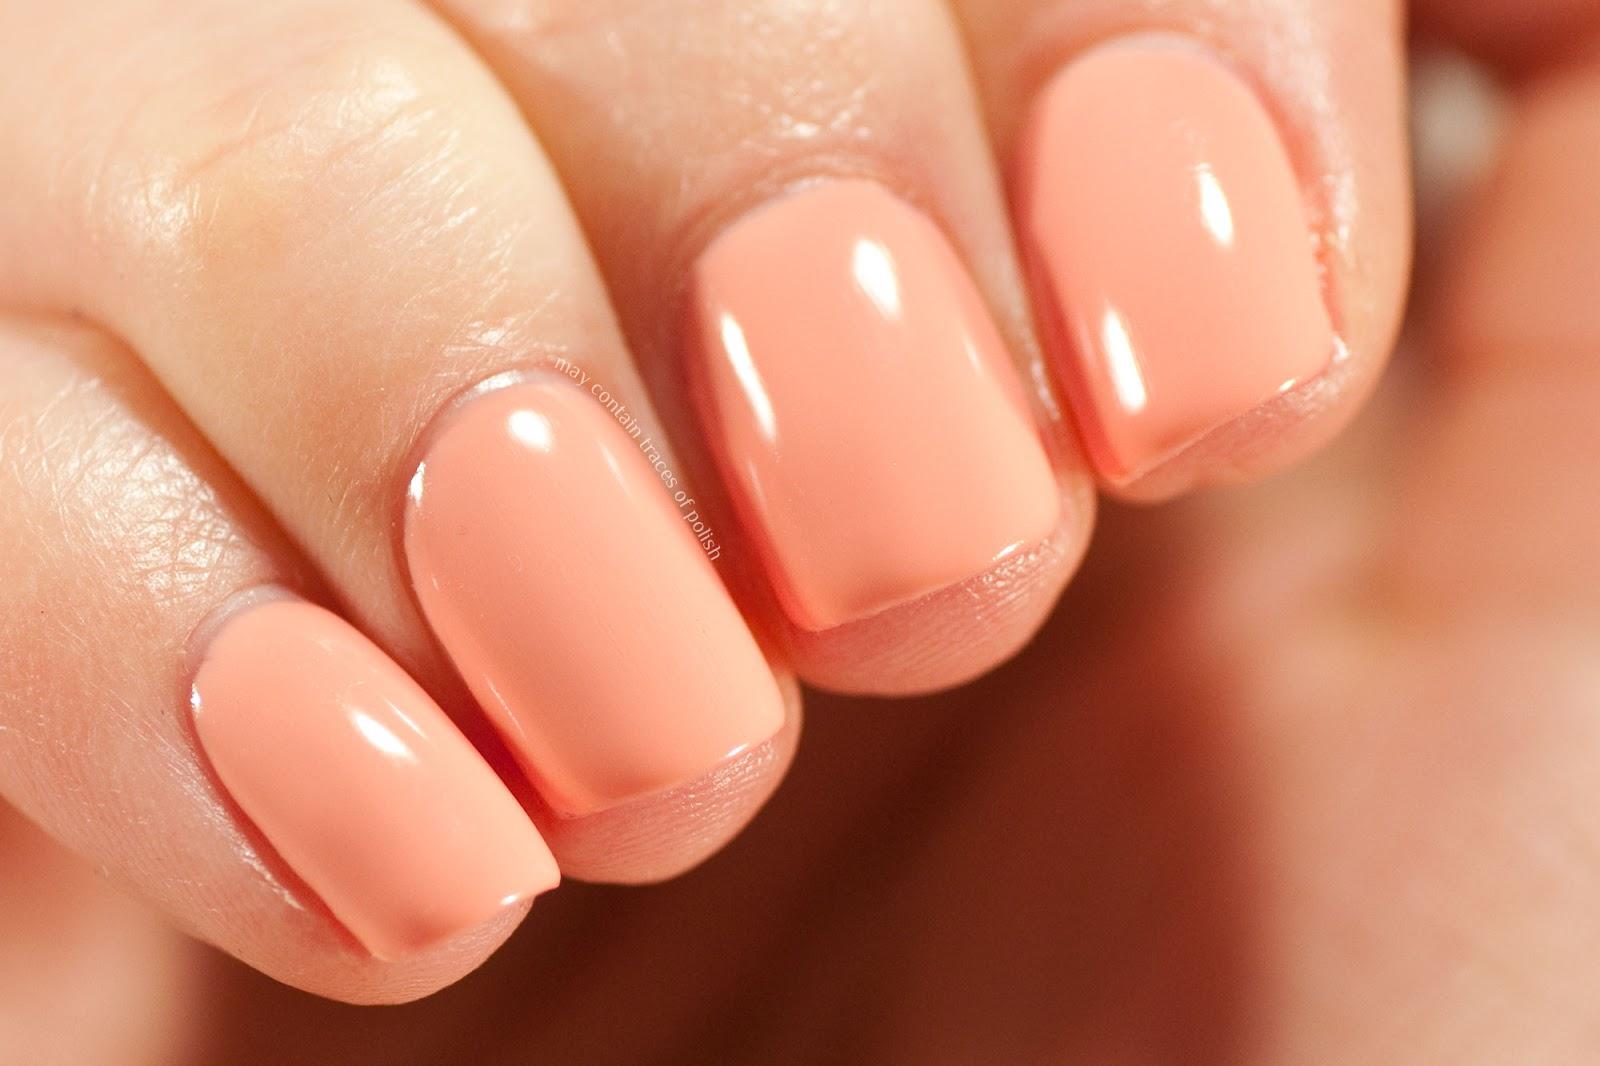 Pink Gellac 286 Serenity Orange Felicity Collection